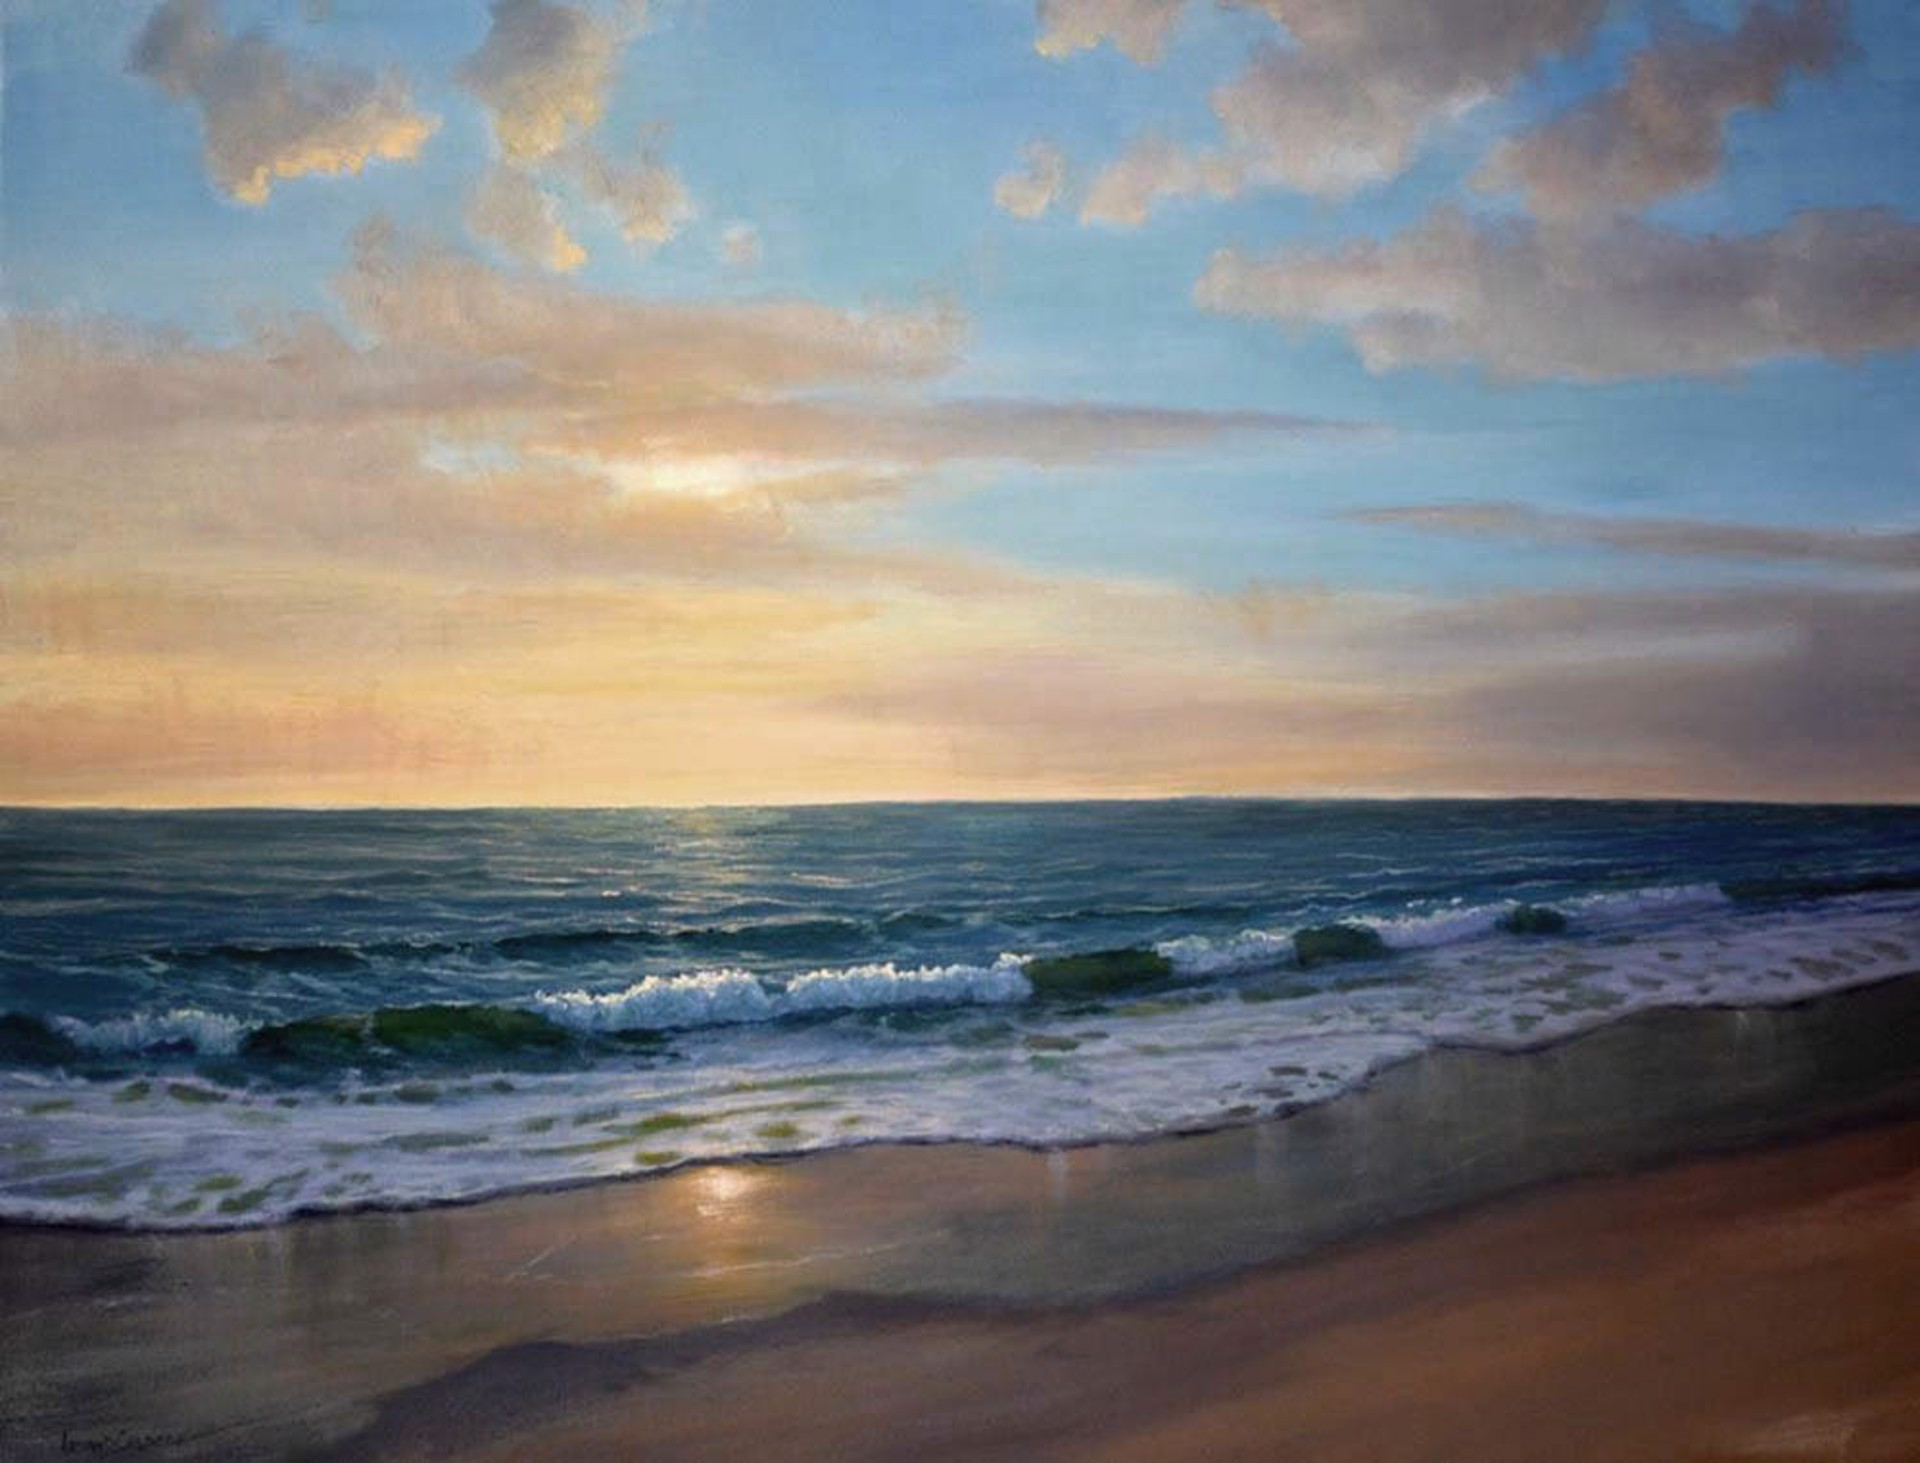 Morning Beach by ARMAND CABRERA